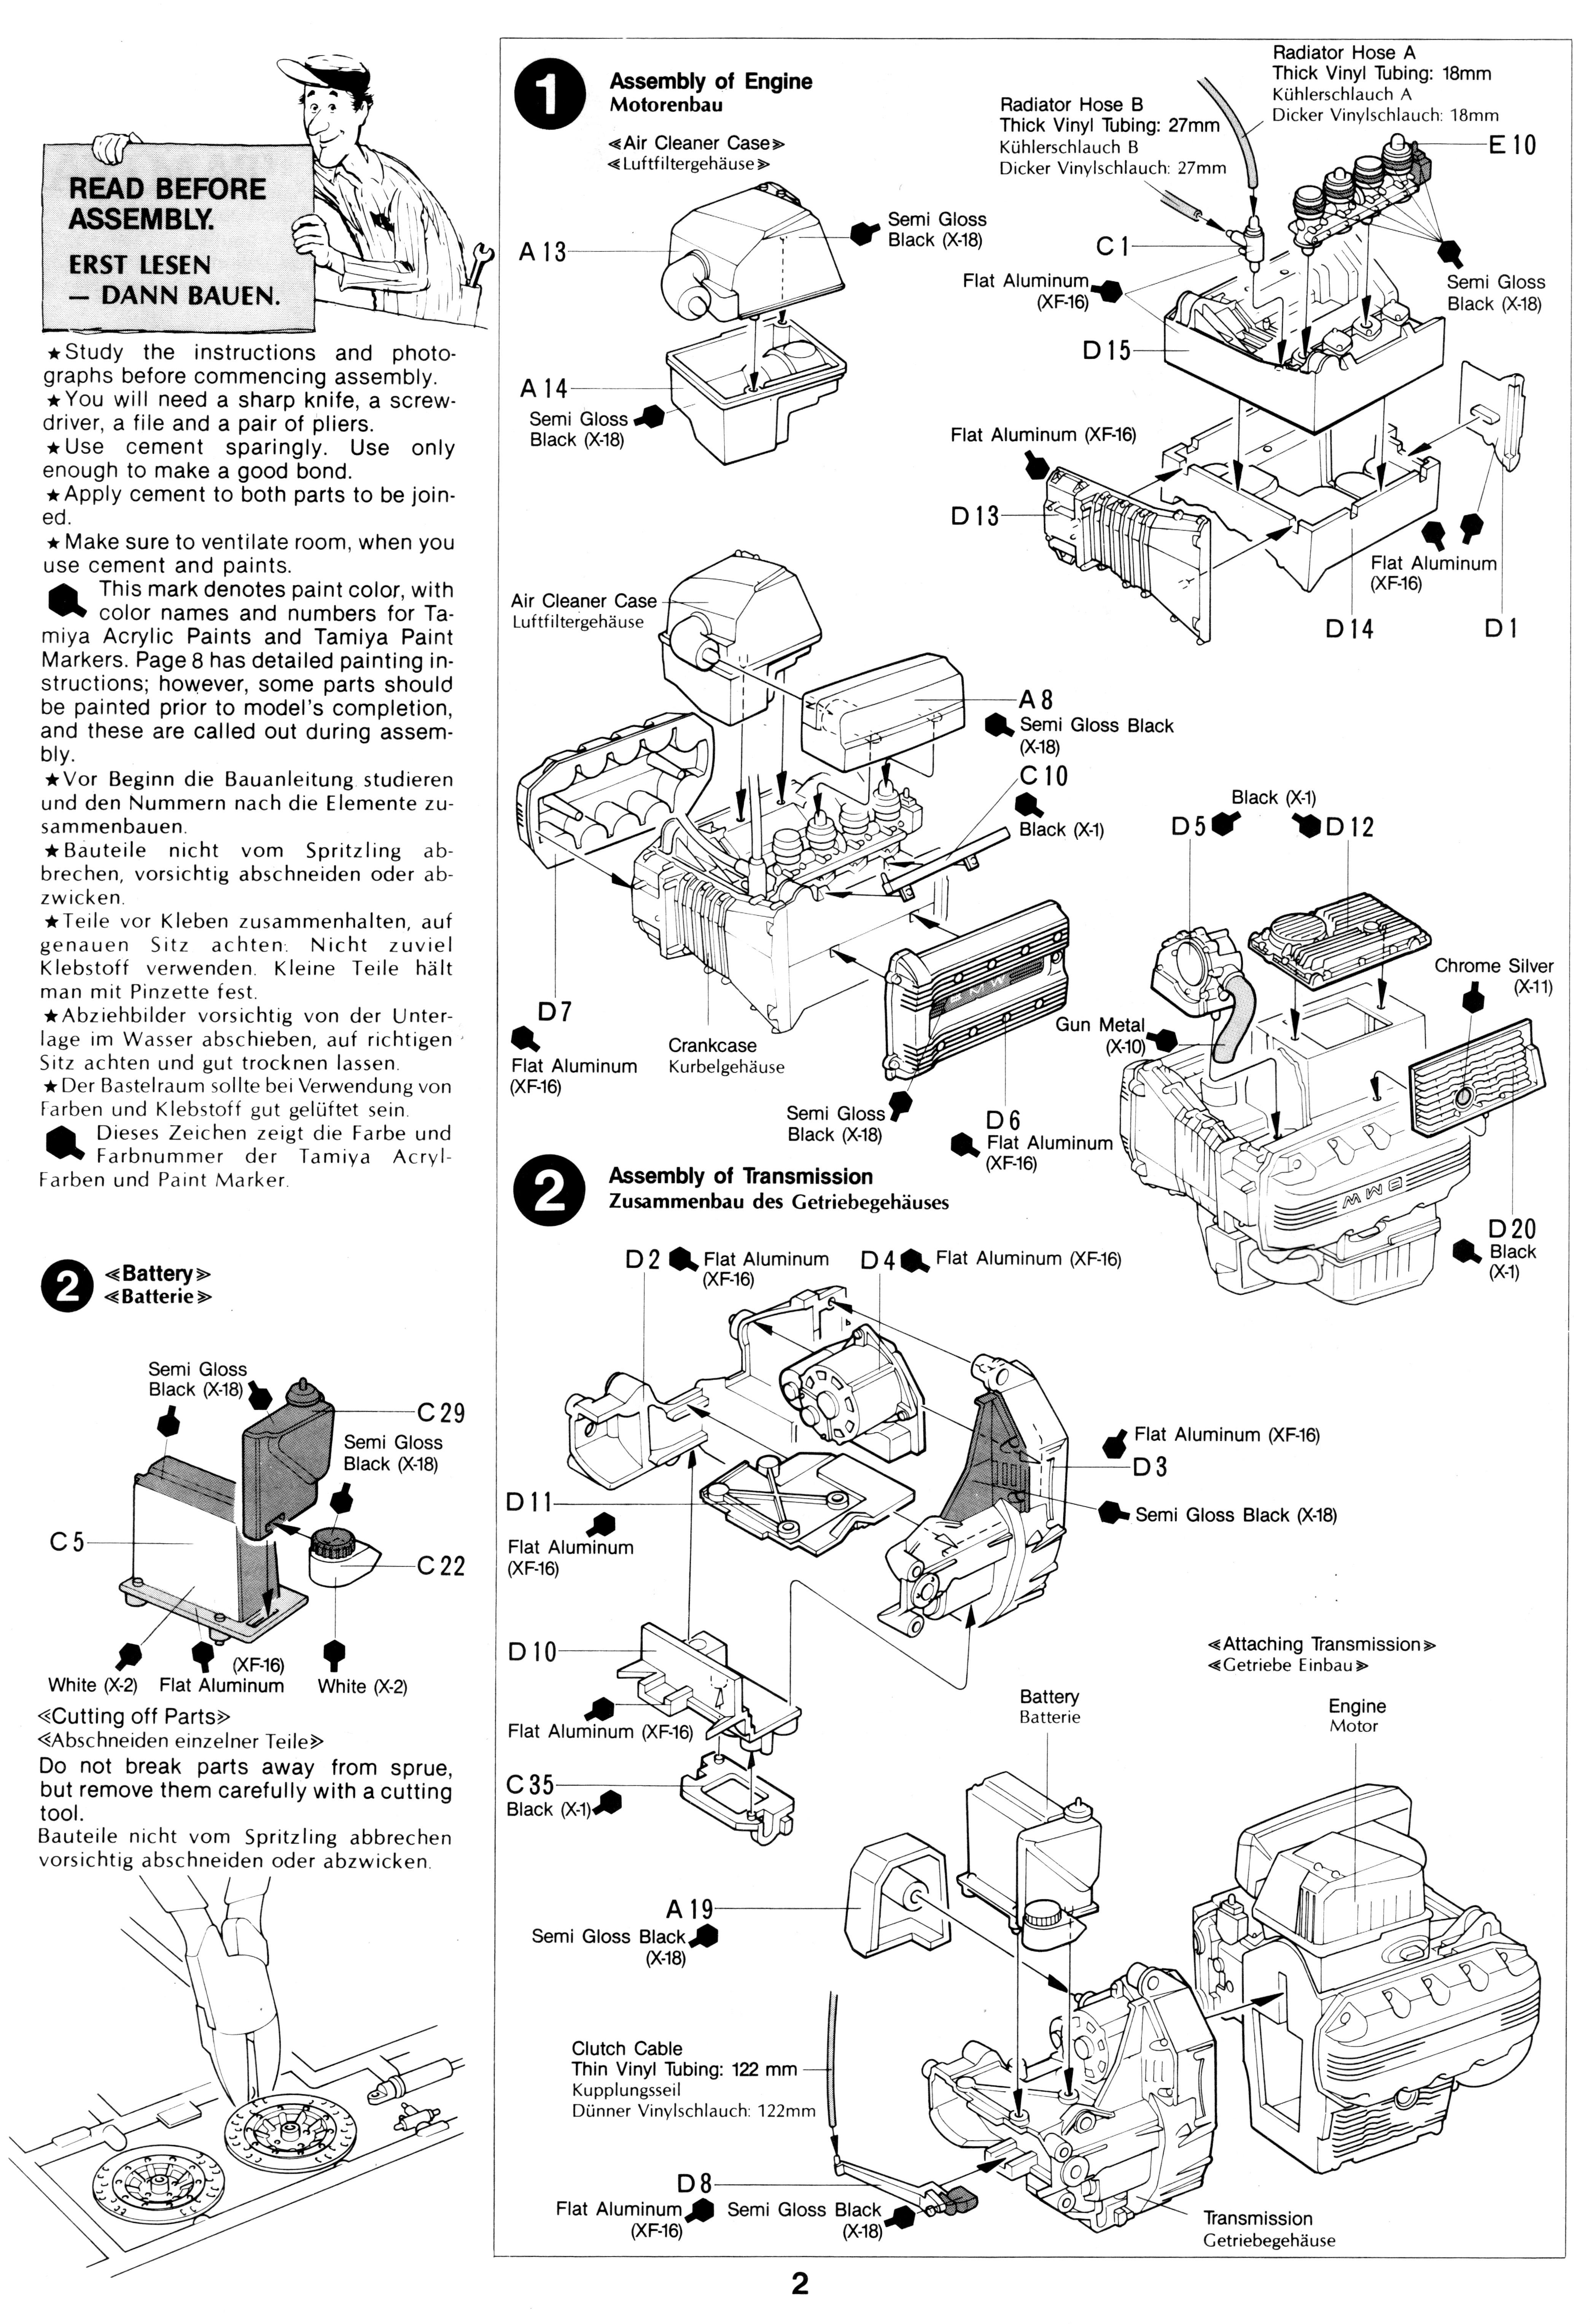 Bmw Car Parts Diagram Pin by Gluefinger On Tamiya 1 12 Bmw K100 Pinterest Of Bmw Car Parts Diagram